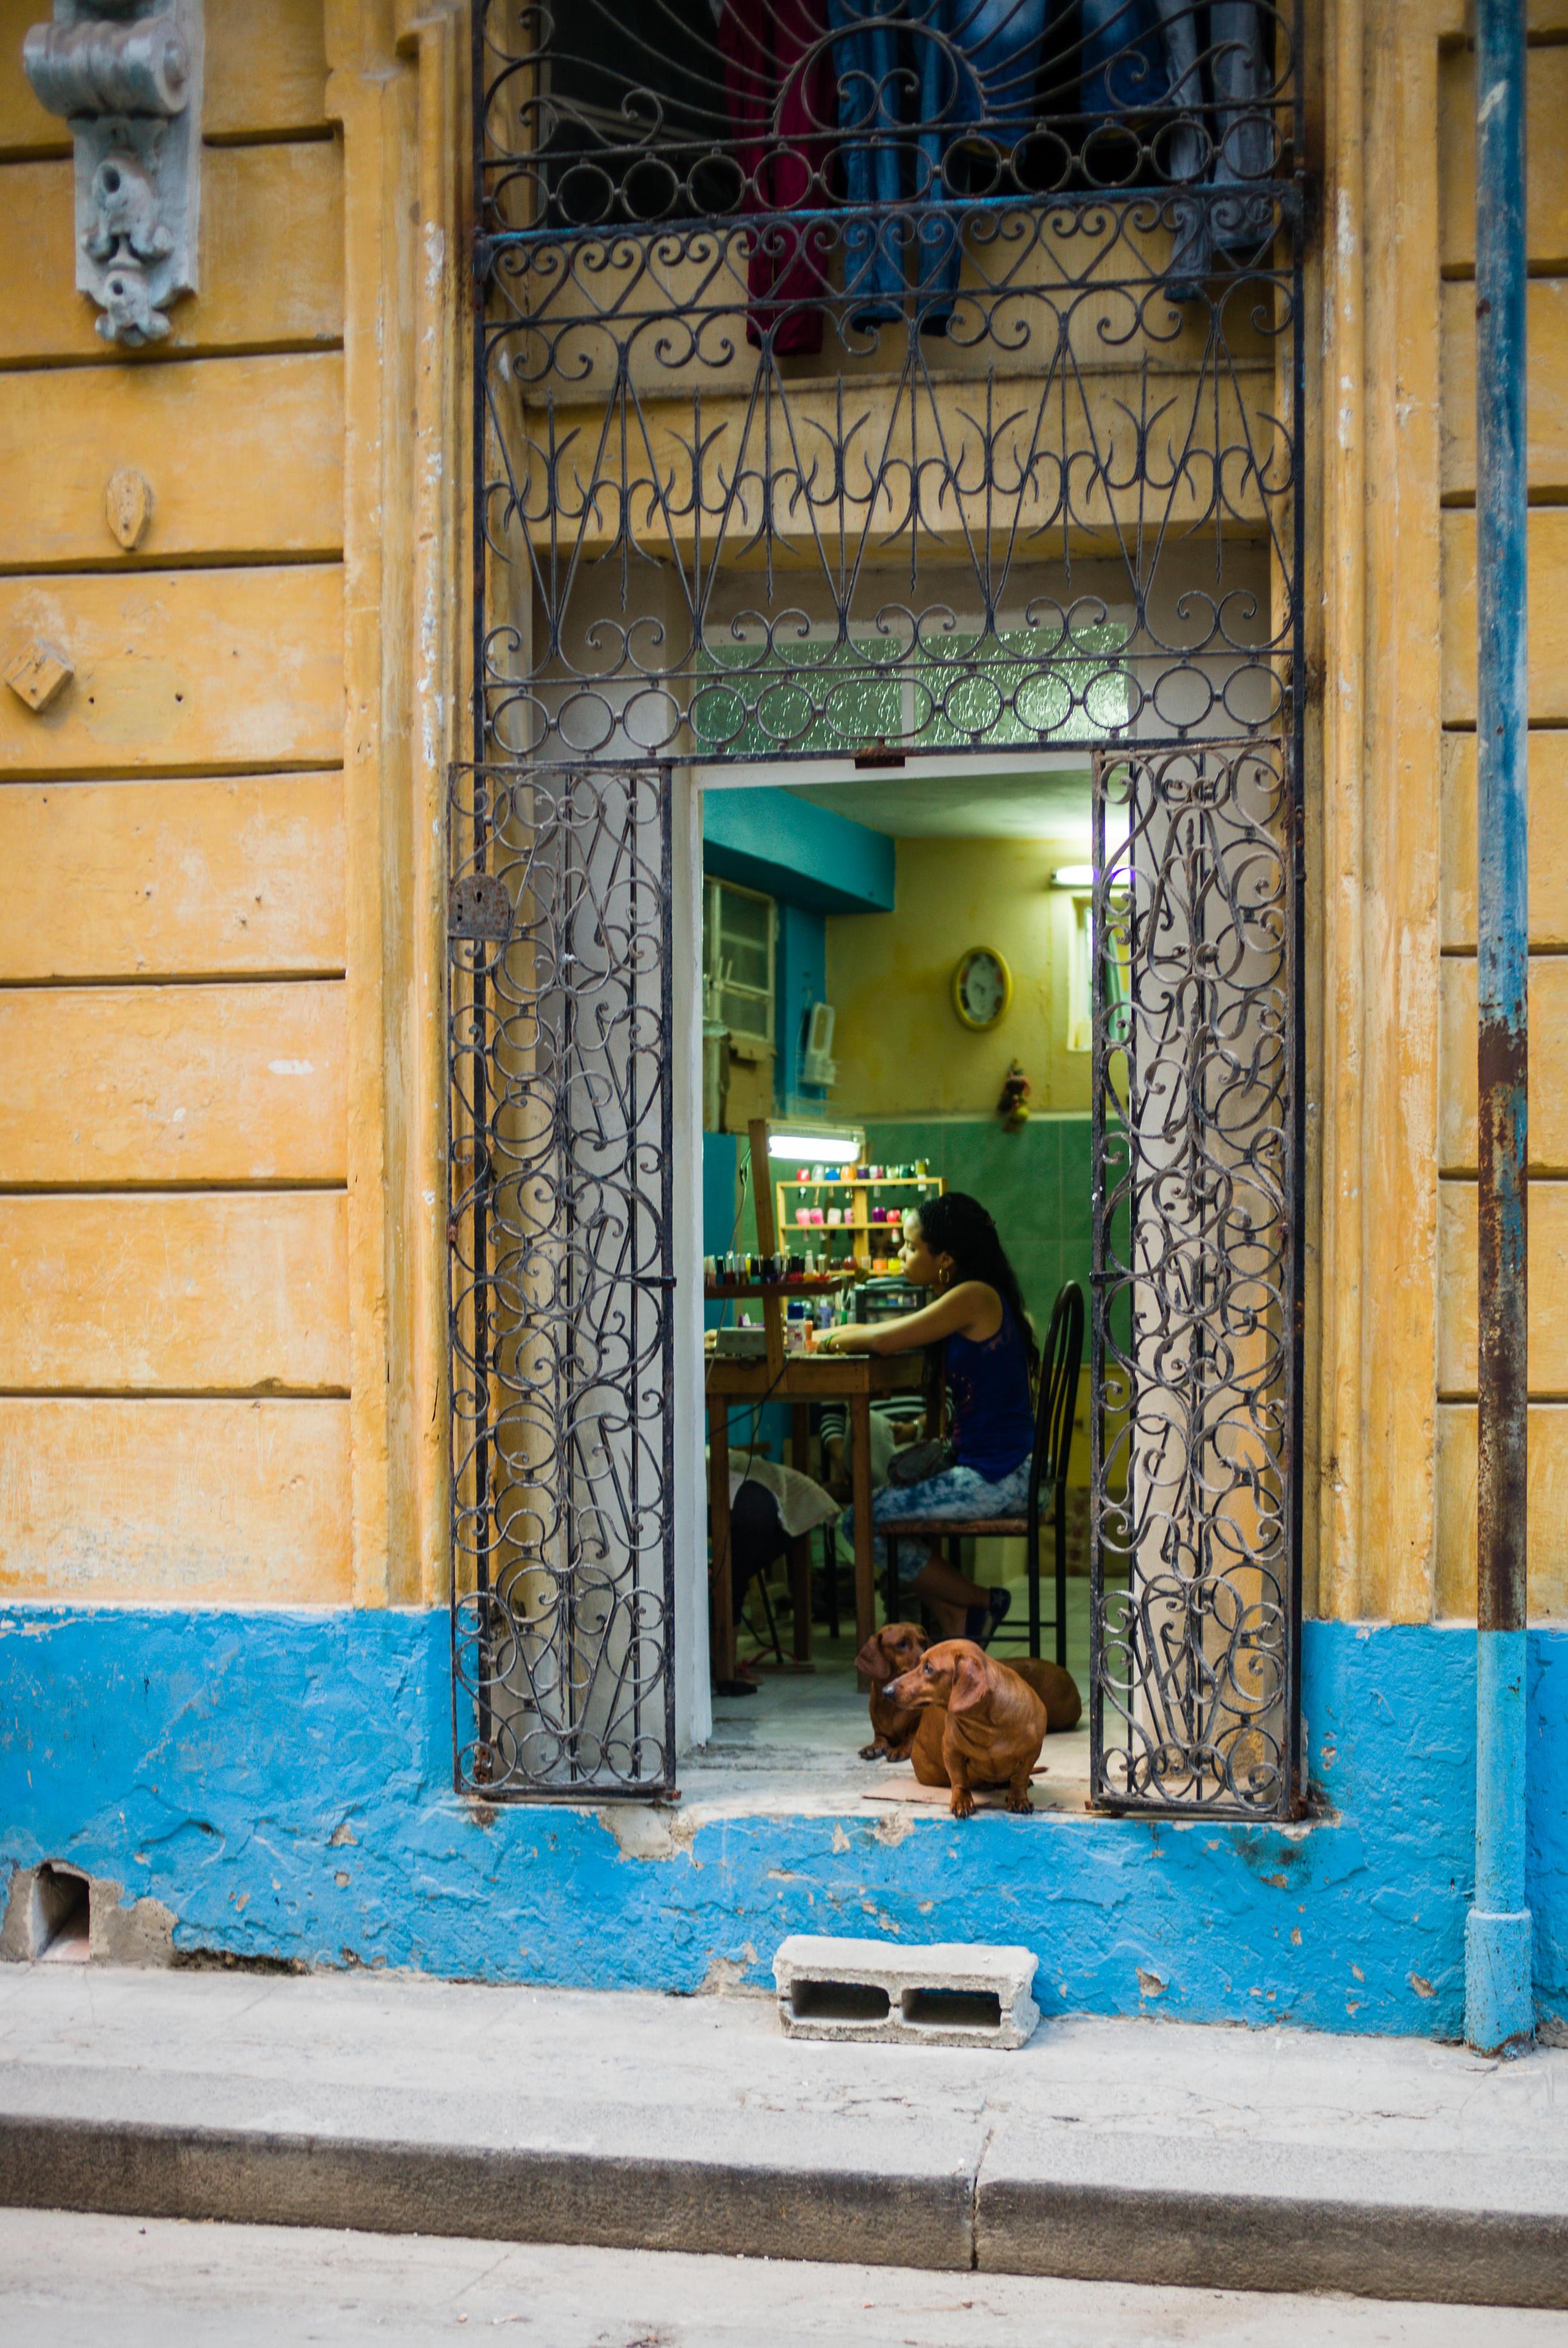 Photo: Cuba / Alamy Stock Photo